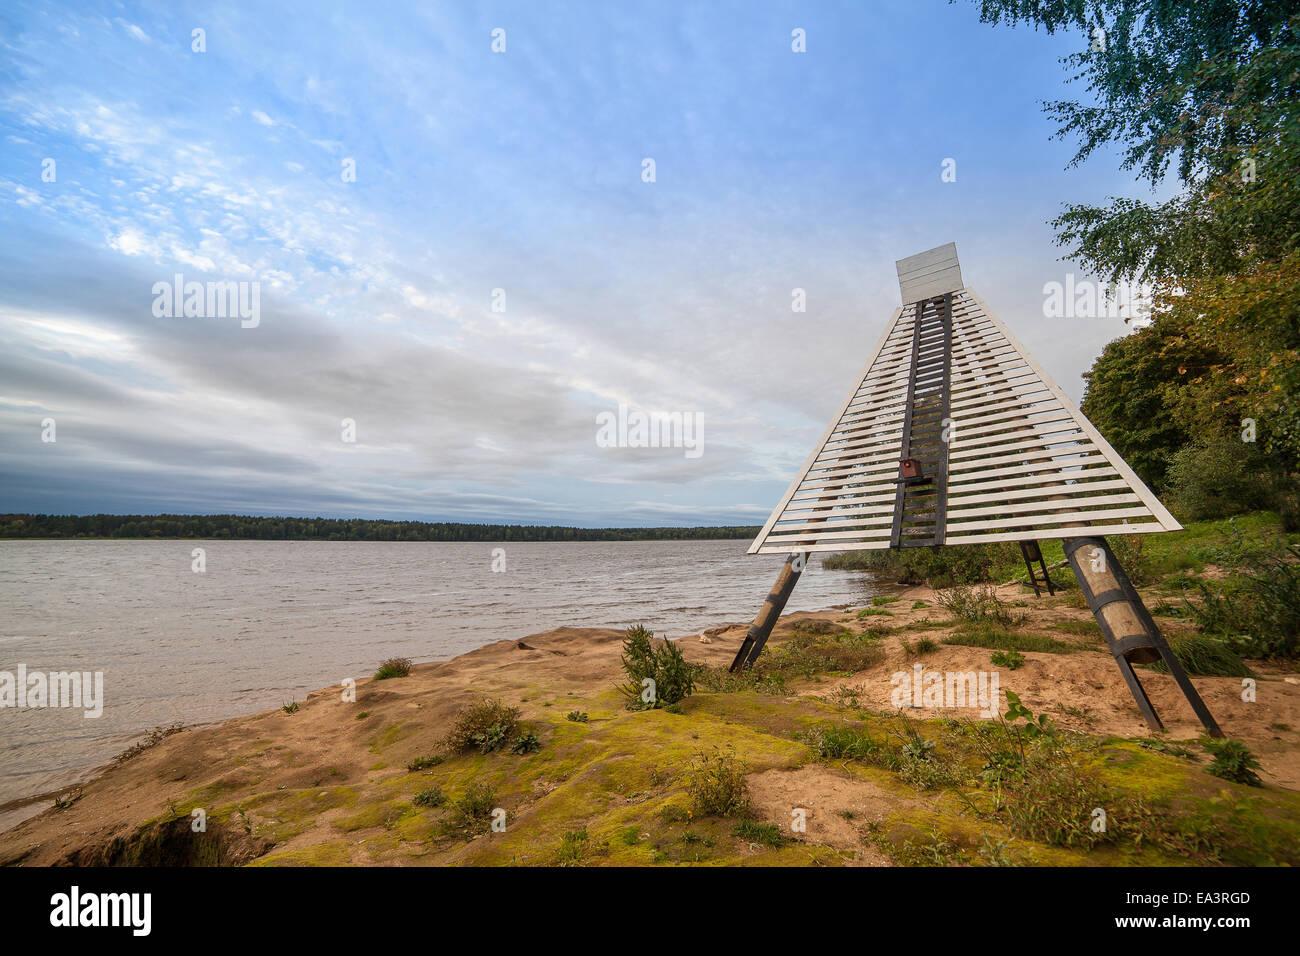 Coastal navigation sign, Volga River, Tver region, Russia - Stock Image